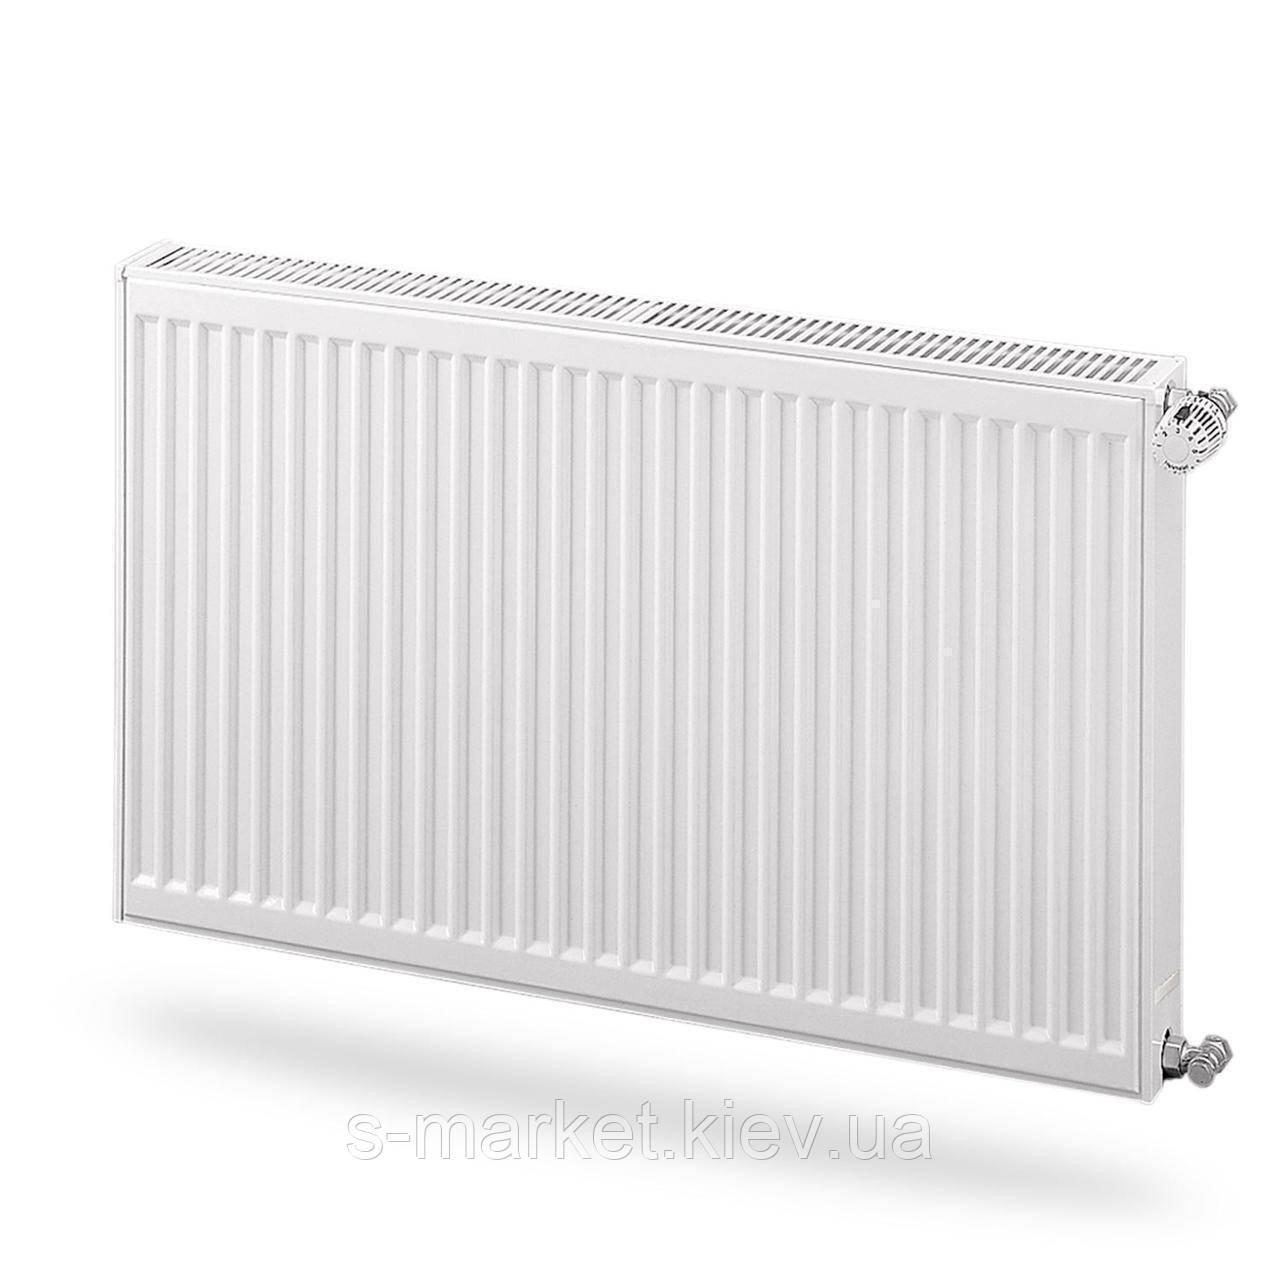 Радиатор Purmo Compact 11 тип 500х800